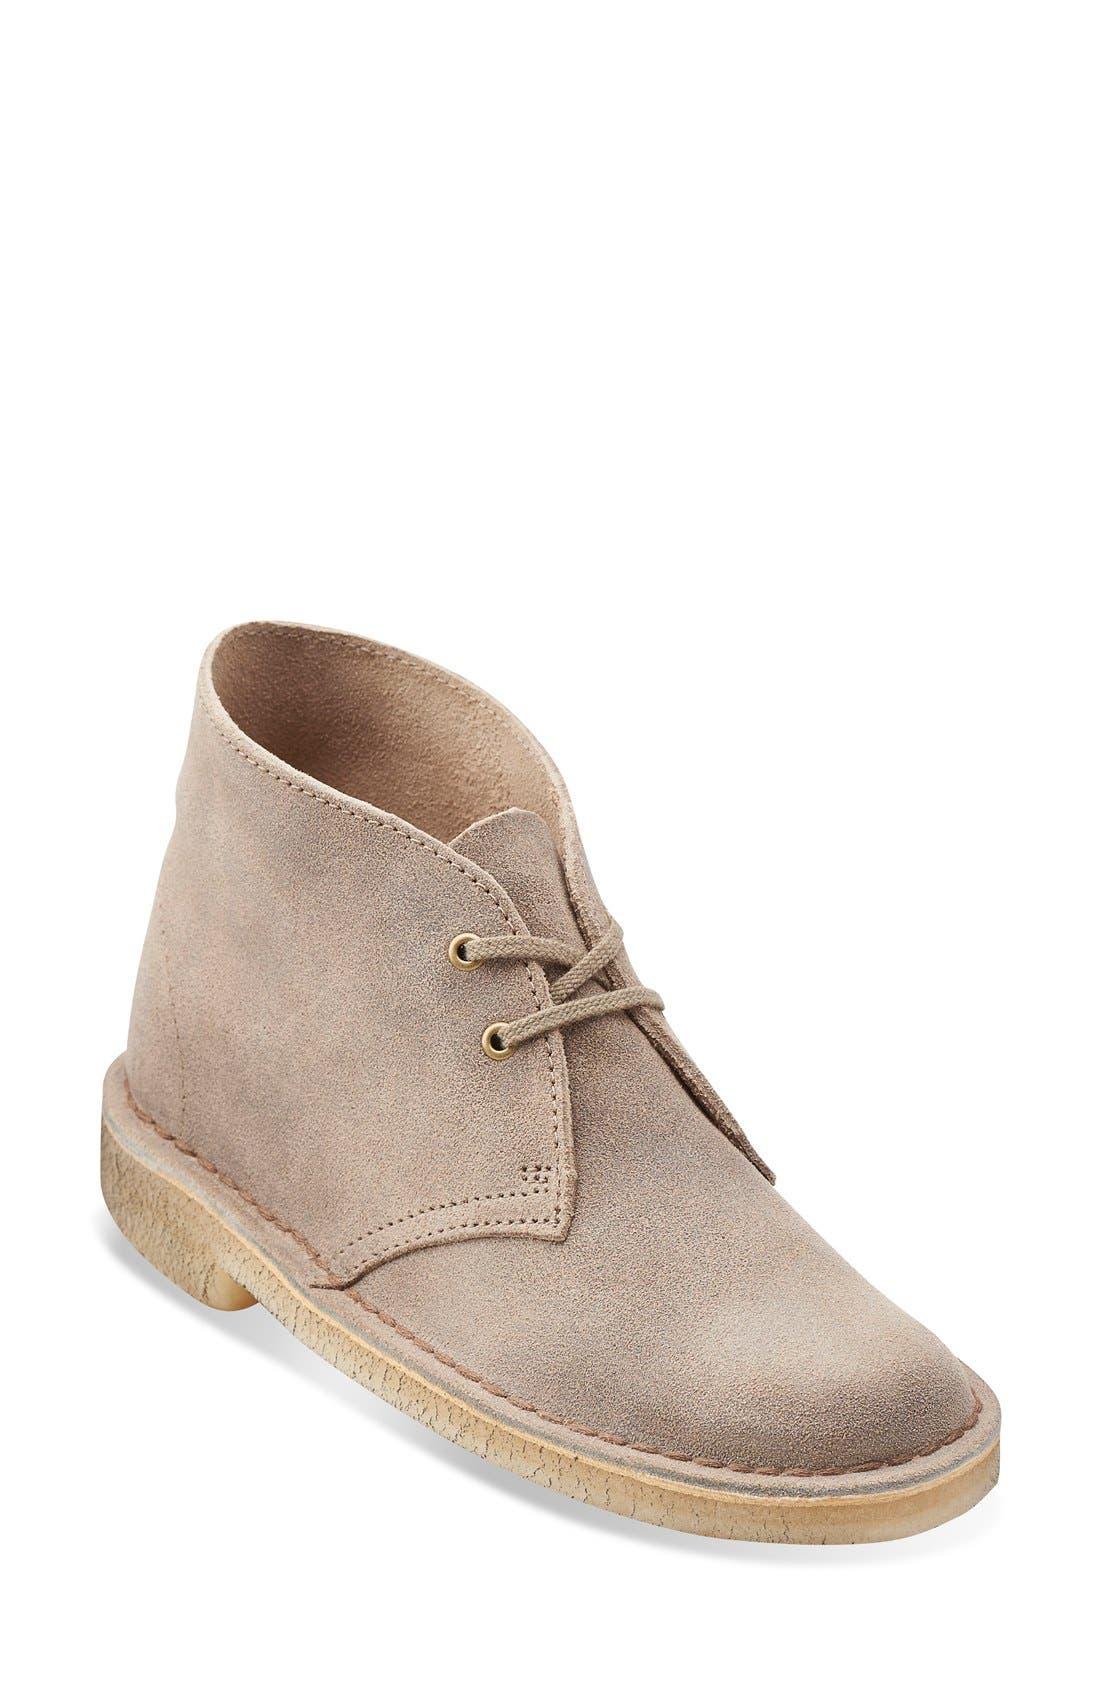 Alternate Image 1 Selected - Clarks® Originals Desert Boot (Women)